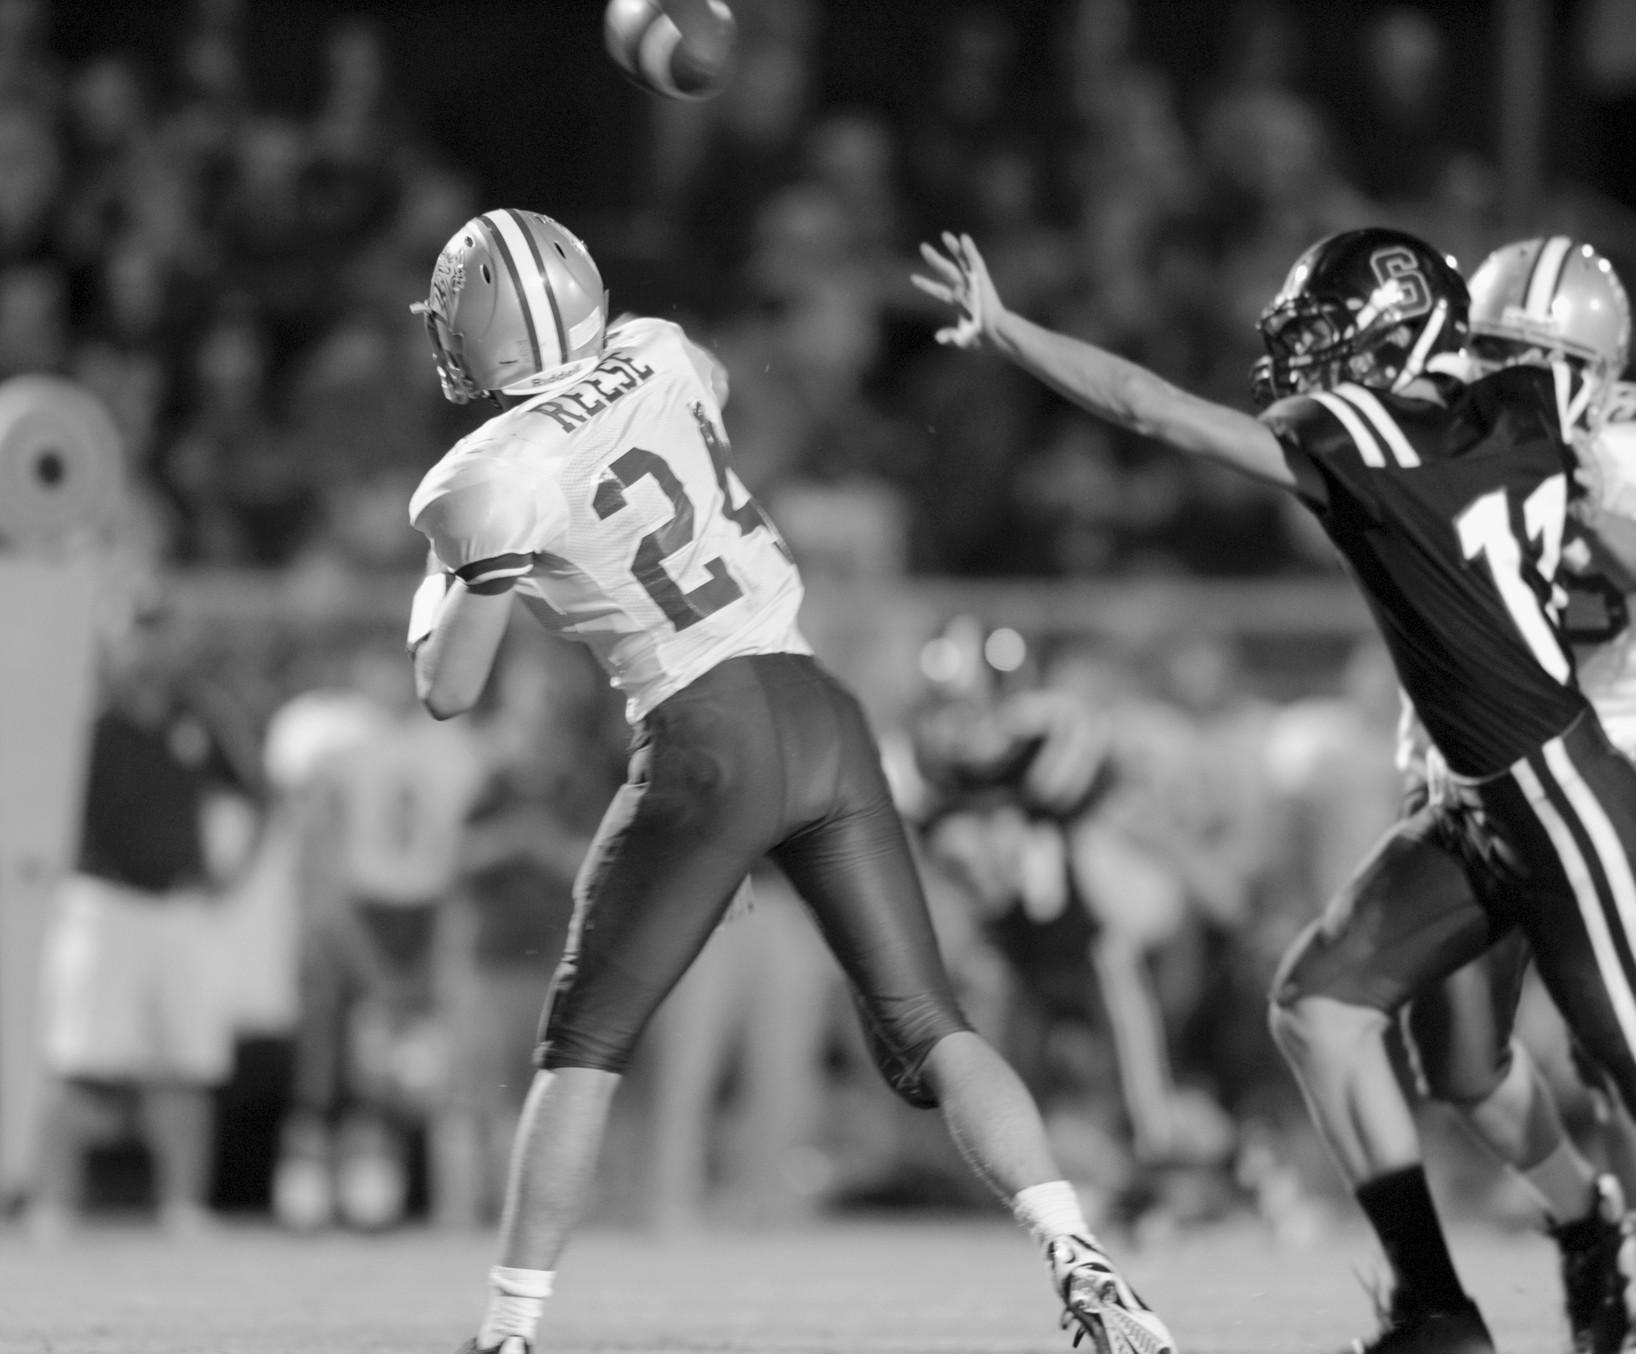 Appalachian quarterback Brandon Reese fires a pass as Southeastern's Austin Cates closes in.